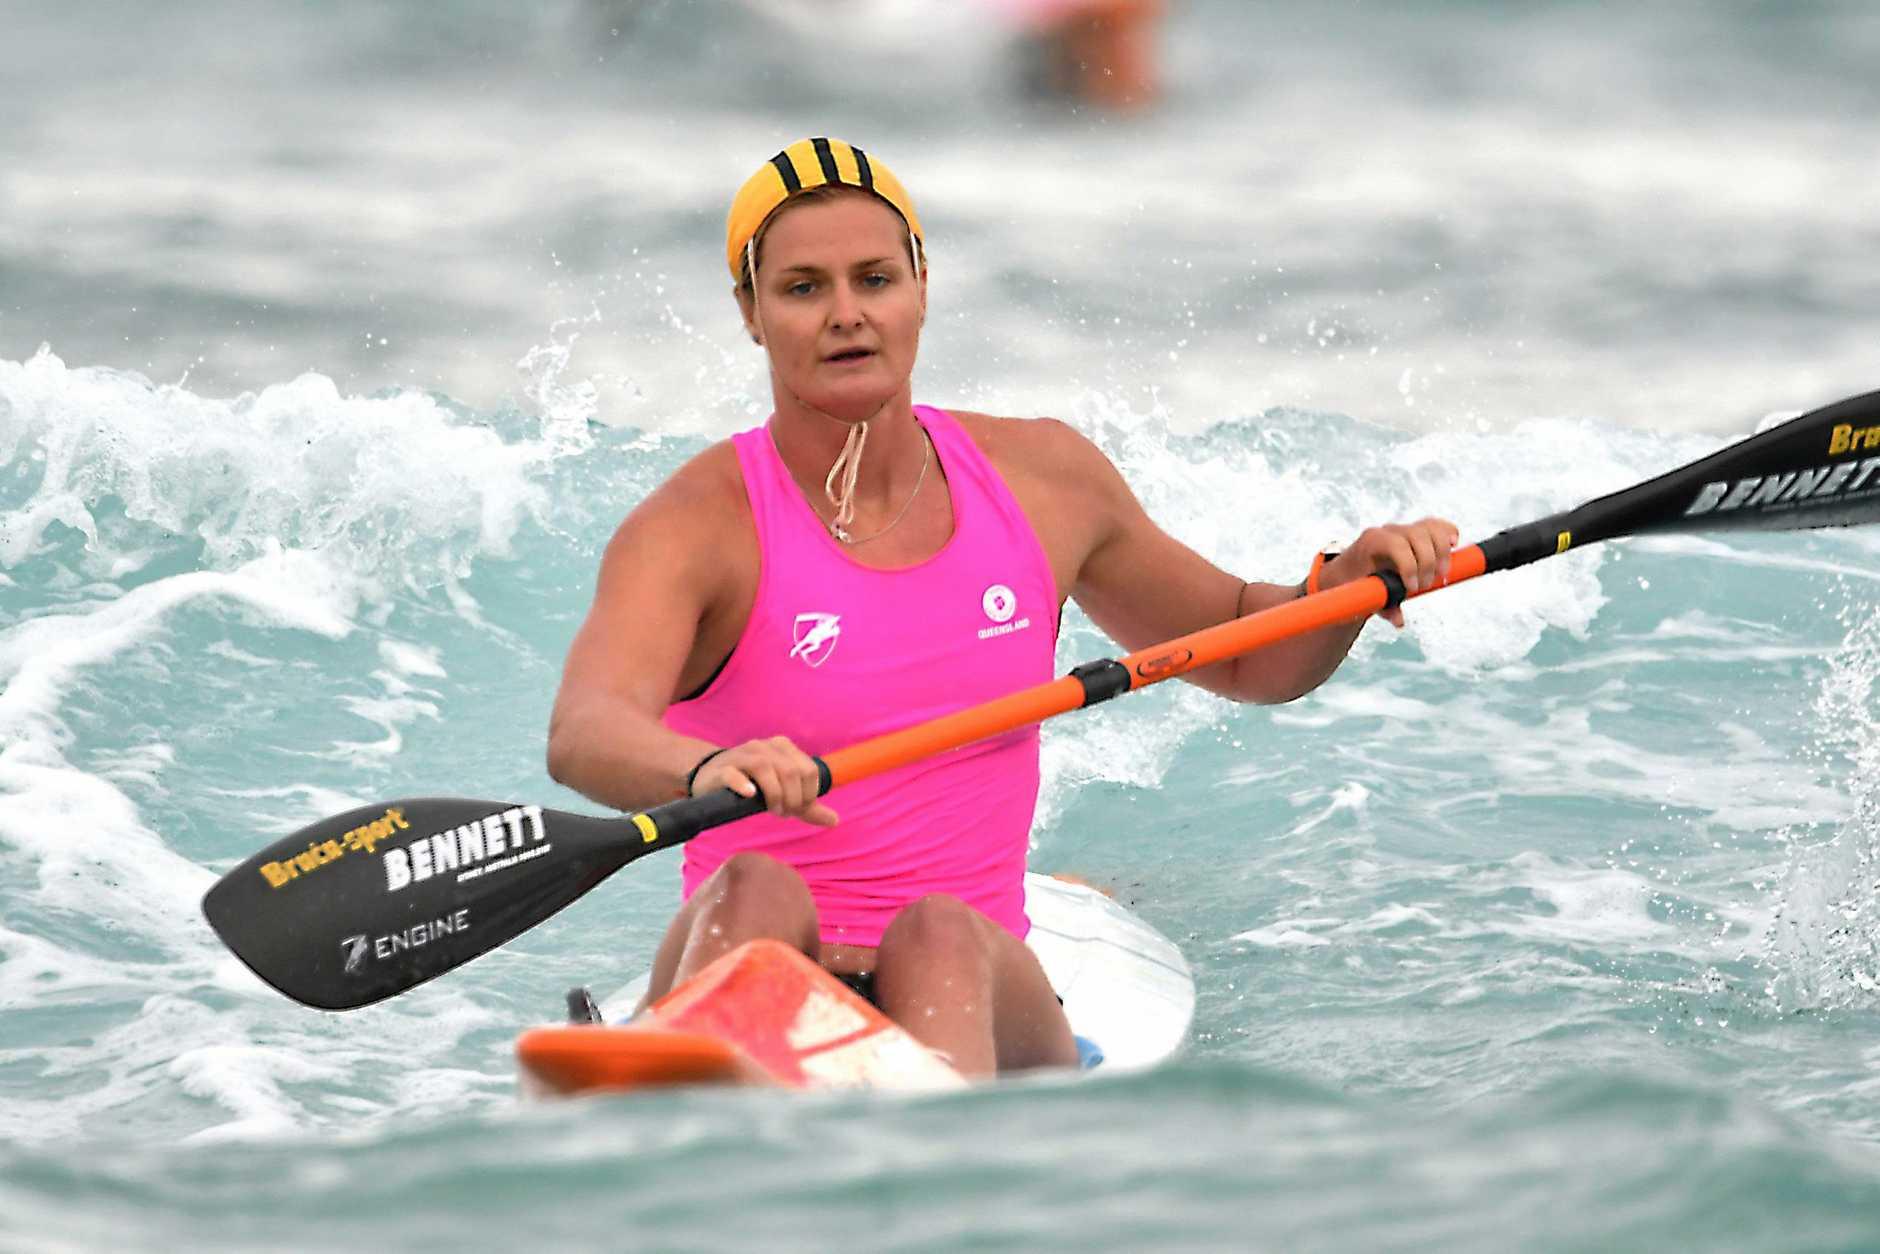 TOP EFFORT: Alexandra Headland won taplin gold during the Queensland Surf Life Saving Championships.